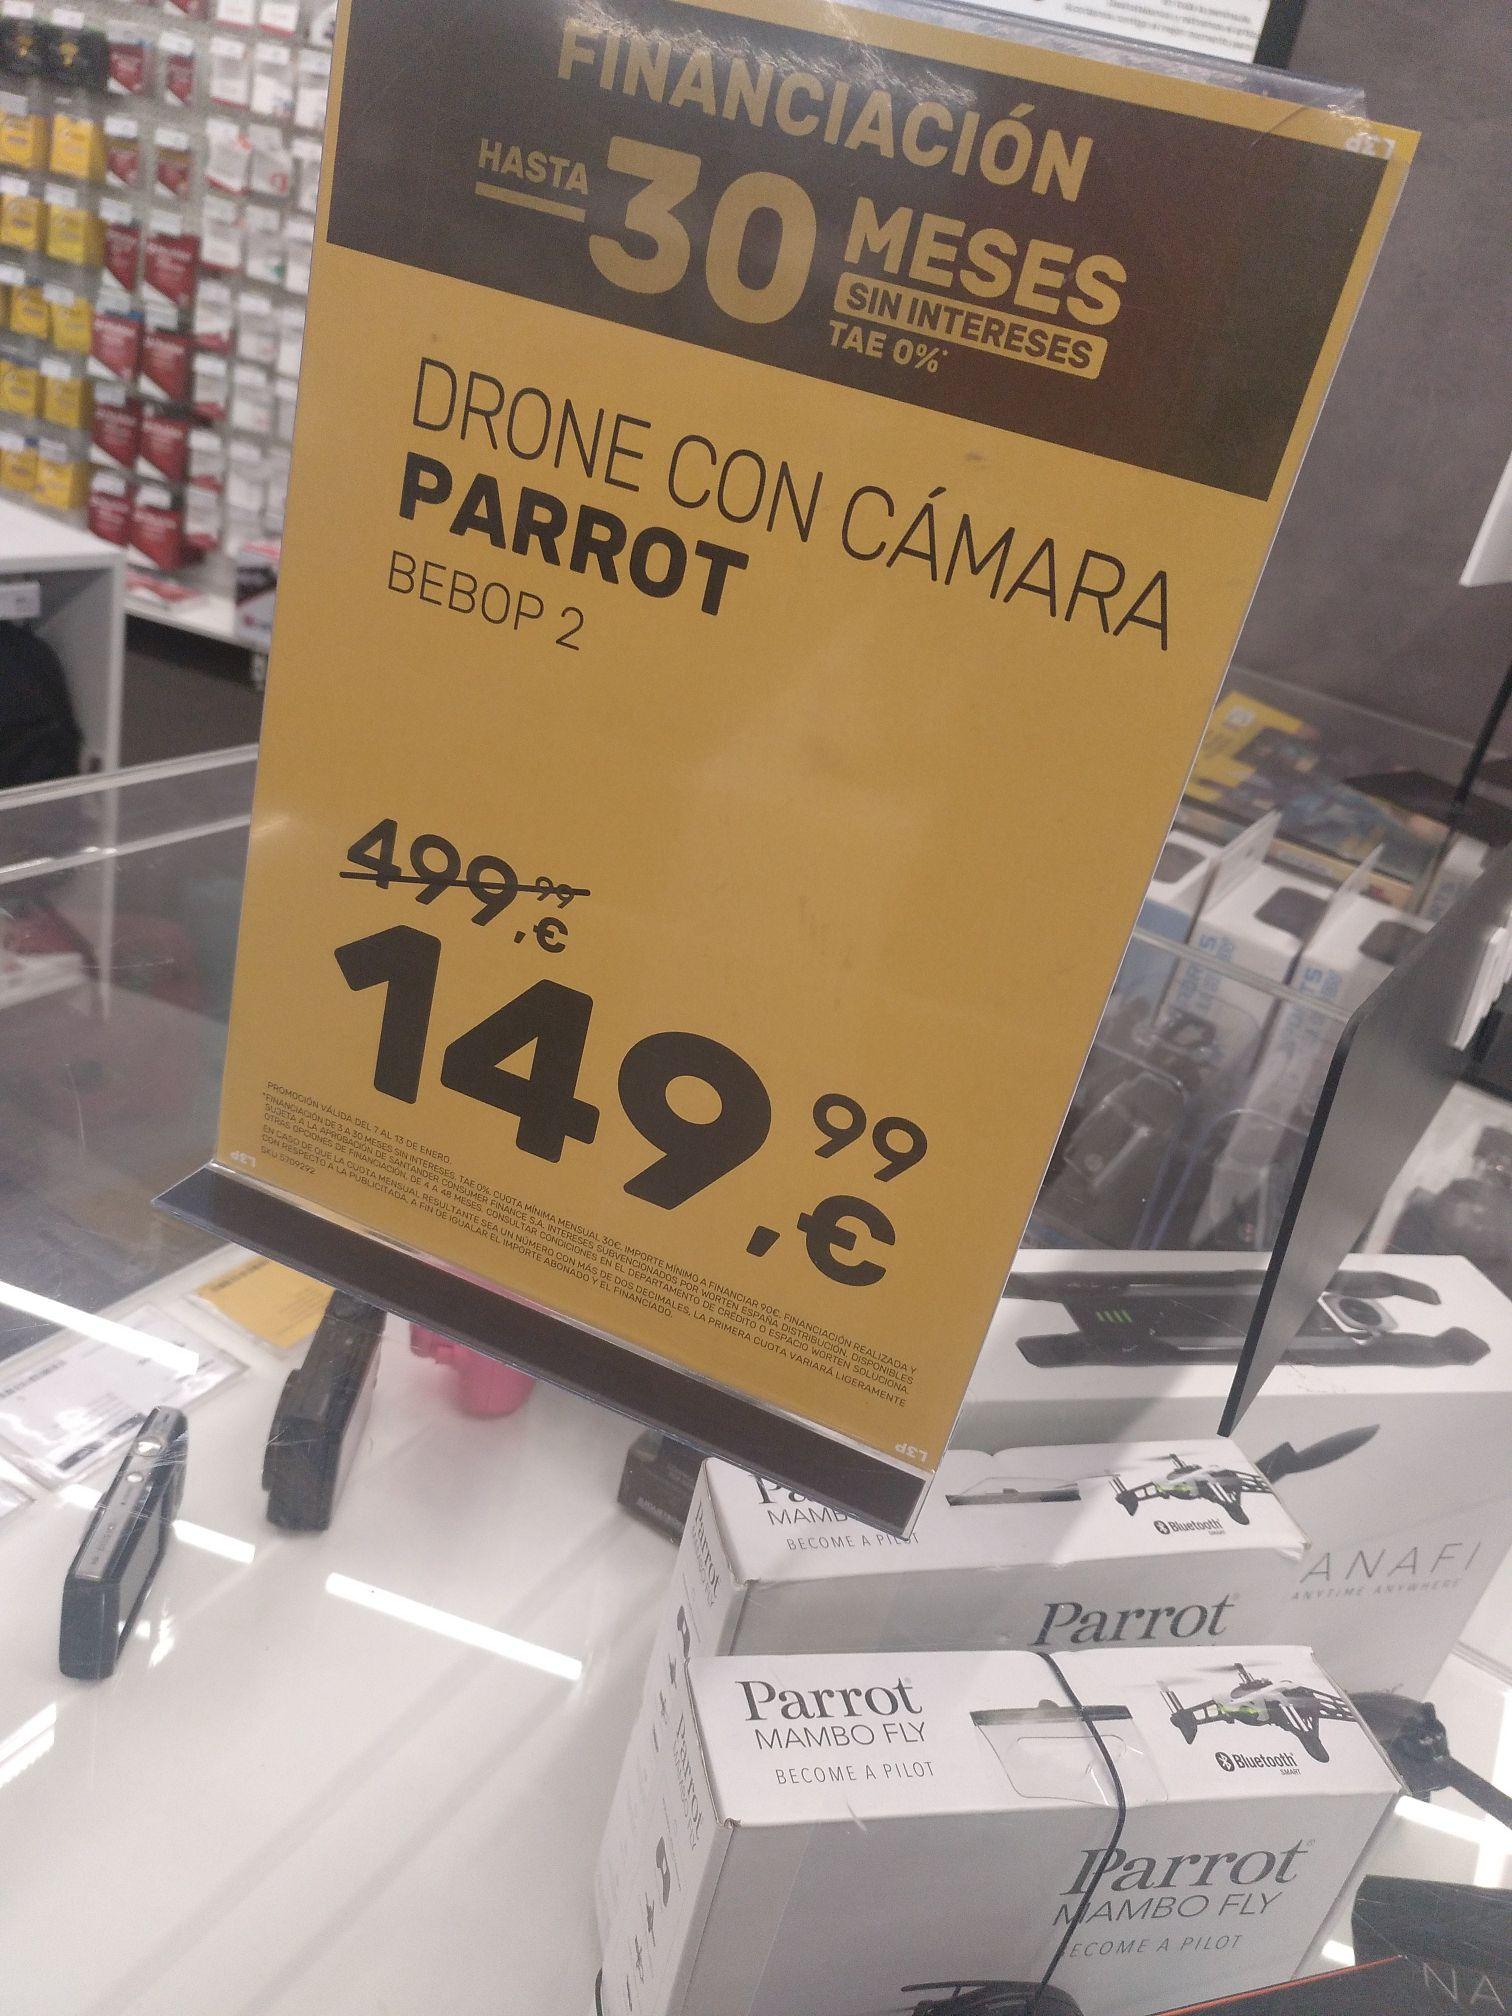 Dron Parrot - Worten